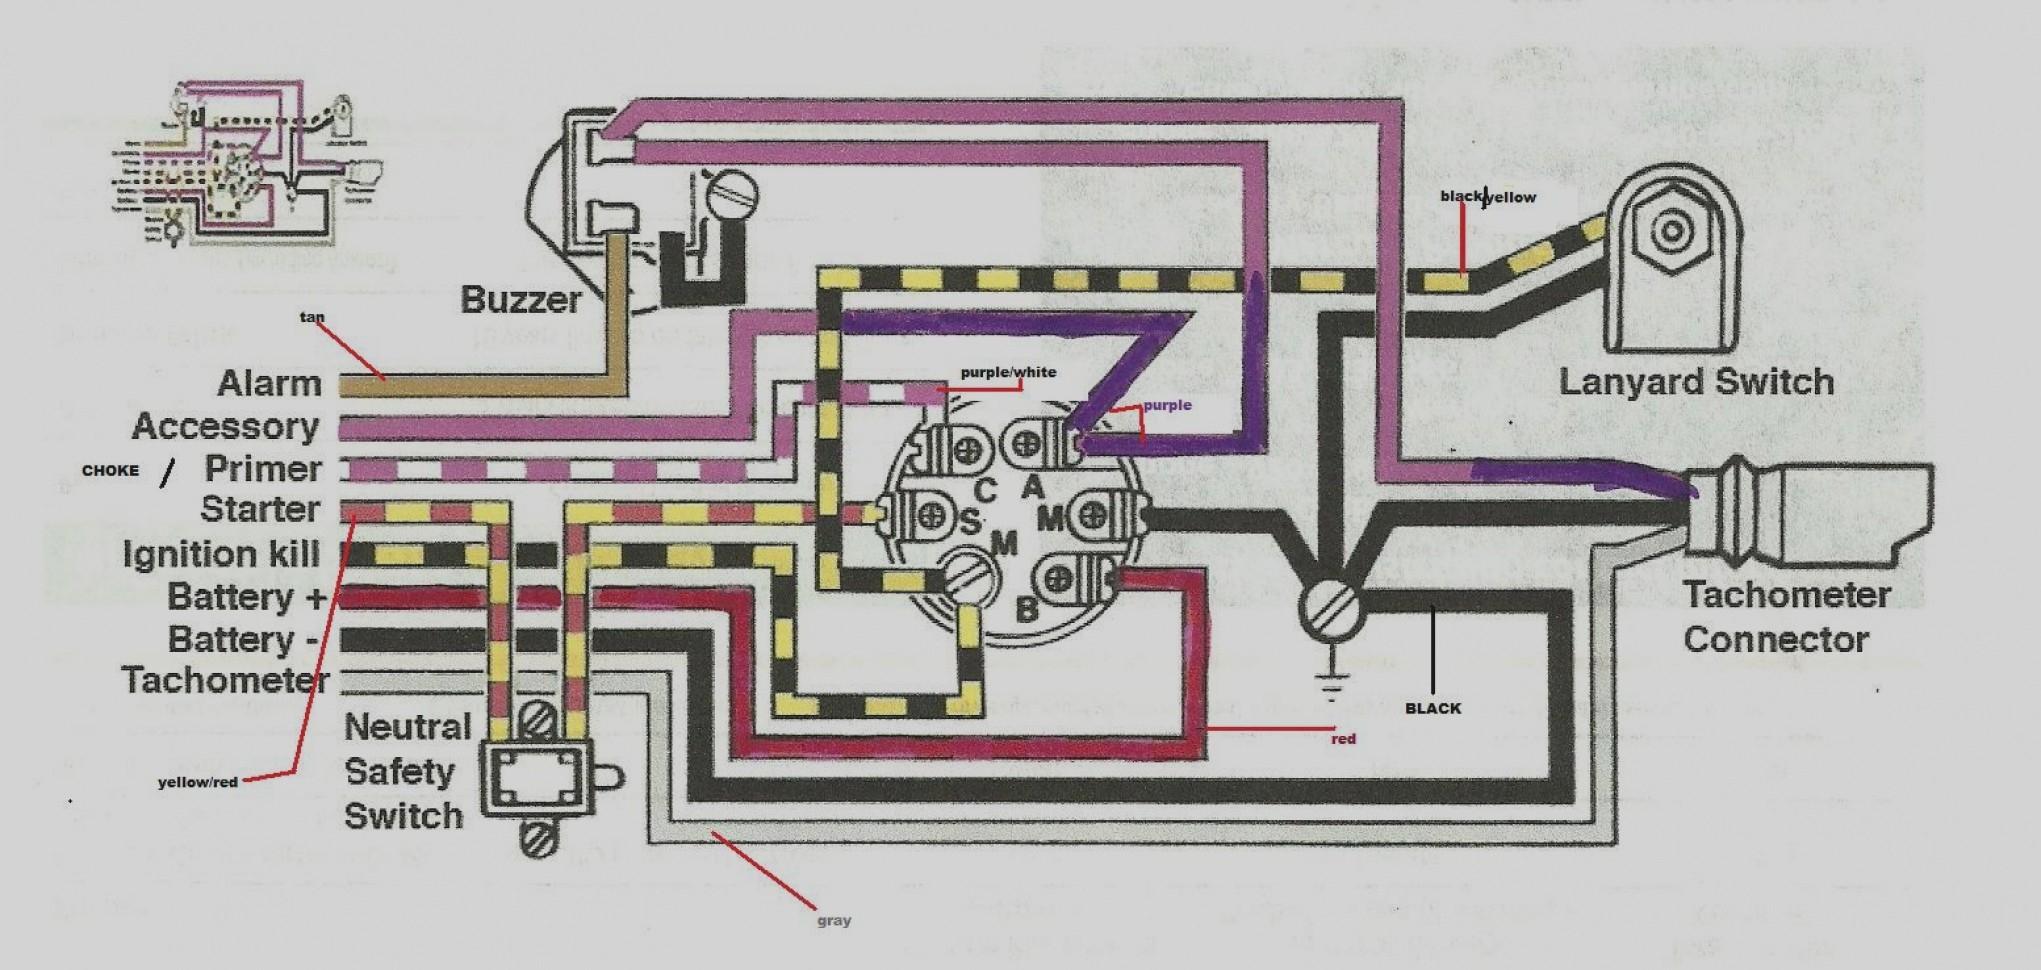 Johnson Neutral Safety Switch Wiring Diagram | Wiring Library - Johnson Ignition Switch Wiring Diagram